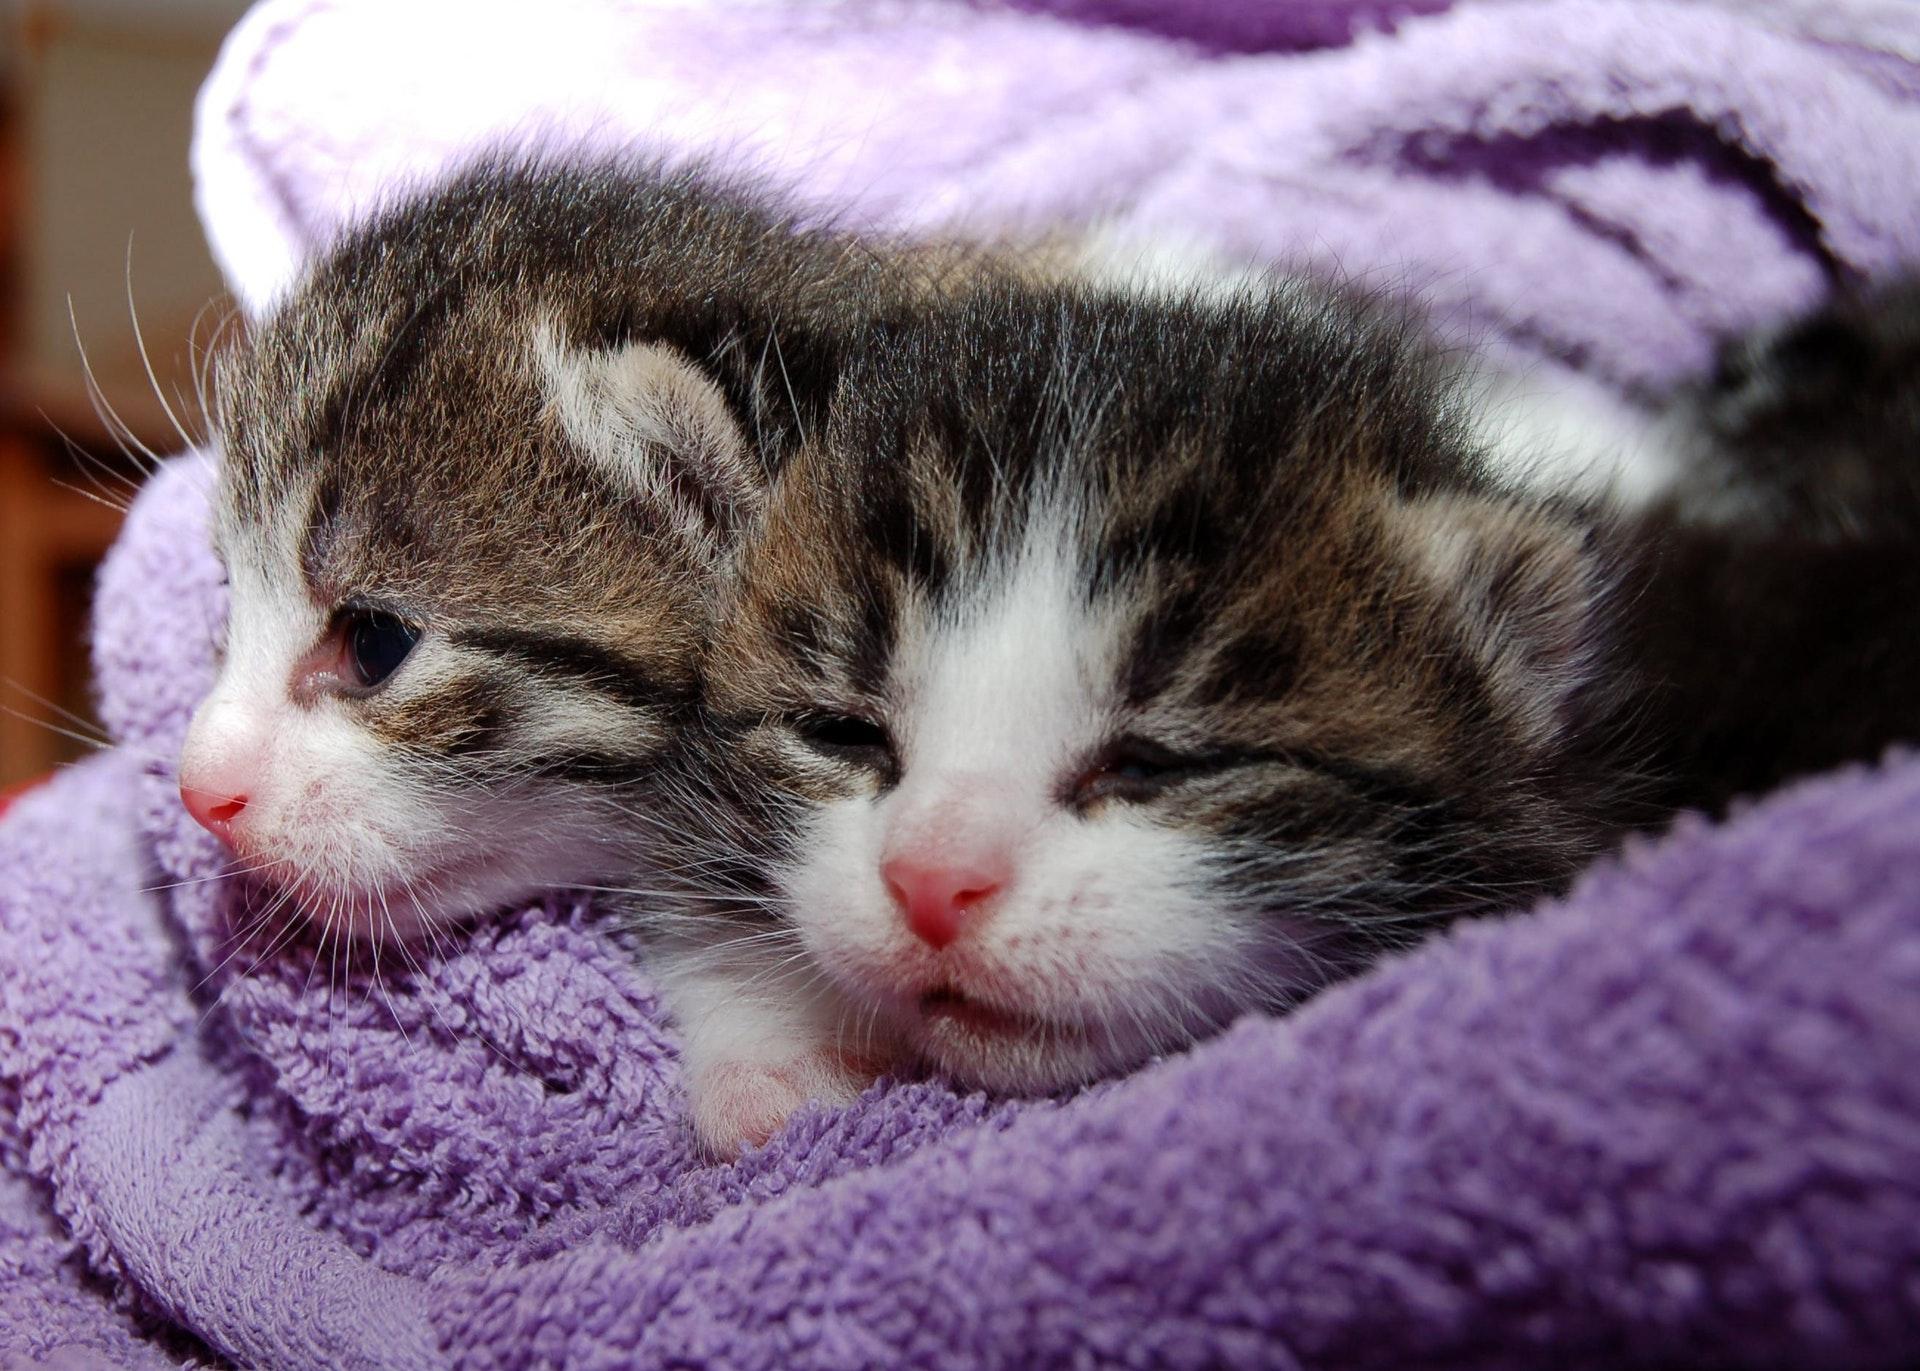 adorable-animals-cat-64147.jpg